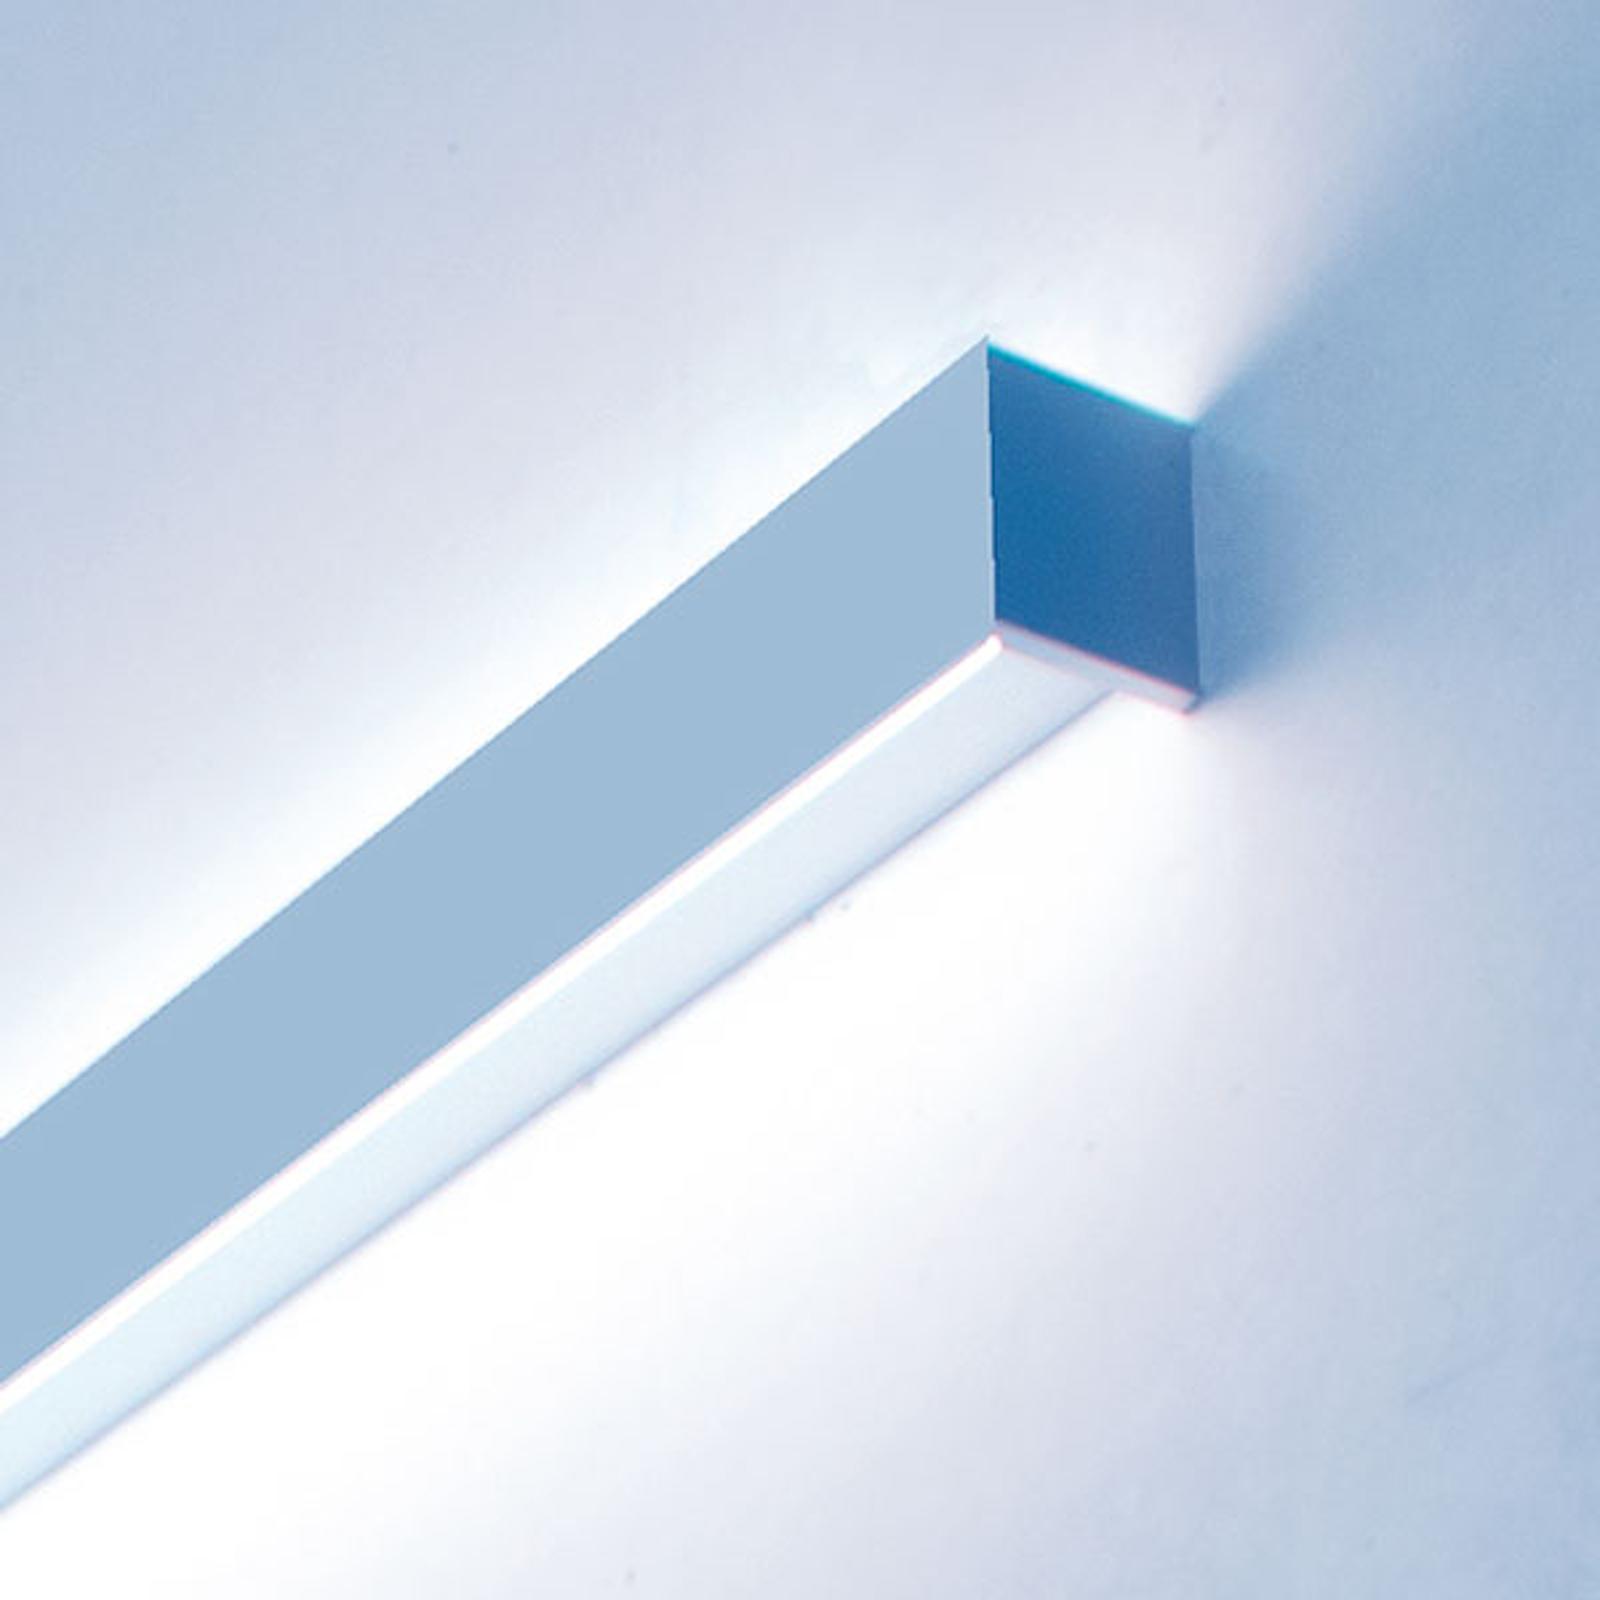 LED-Wandleuchte Matric W1 in 206 cm, 3.000 K